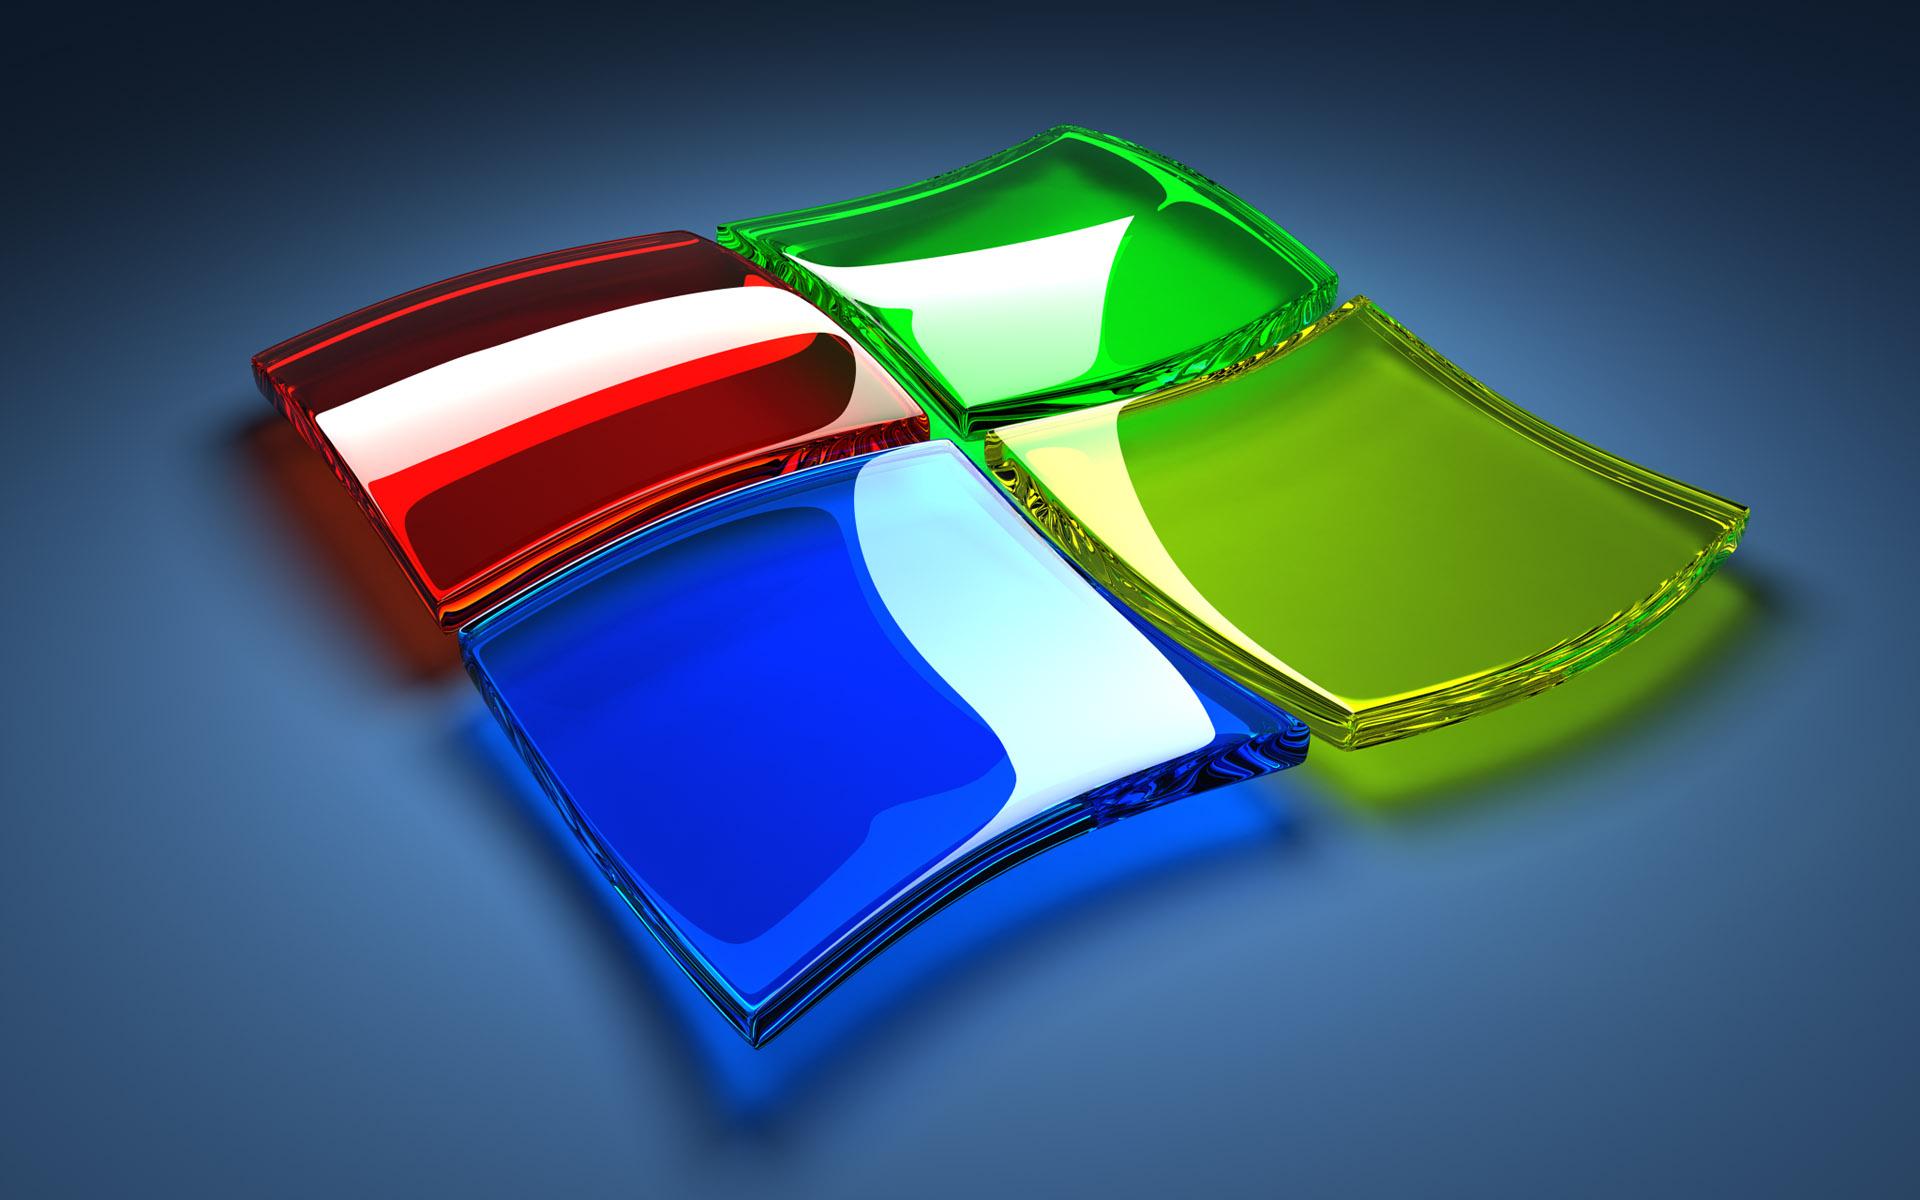 Windows 7 backgrounds hd Wallpaper | High Quality Wallpapers,Wallpaper ...